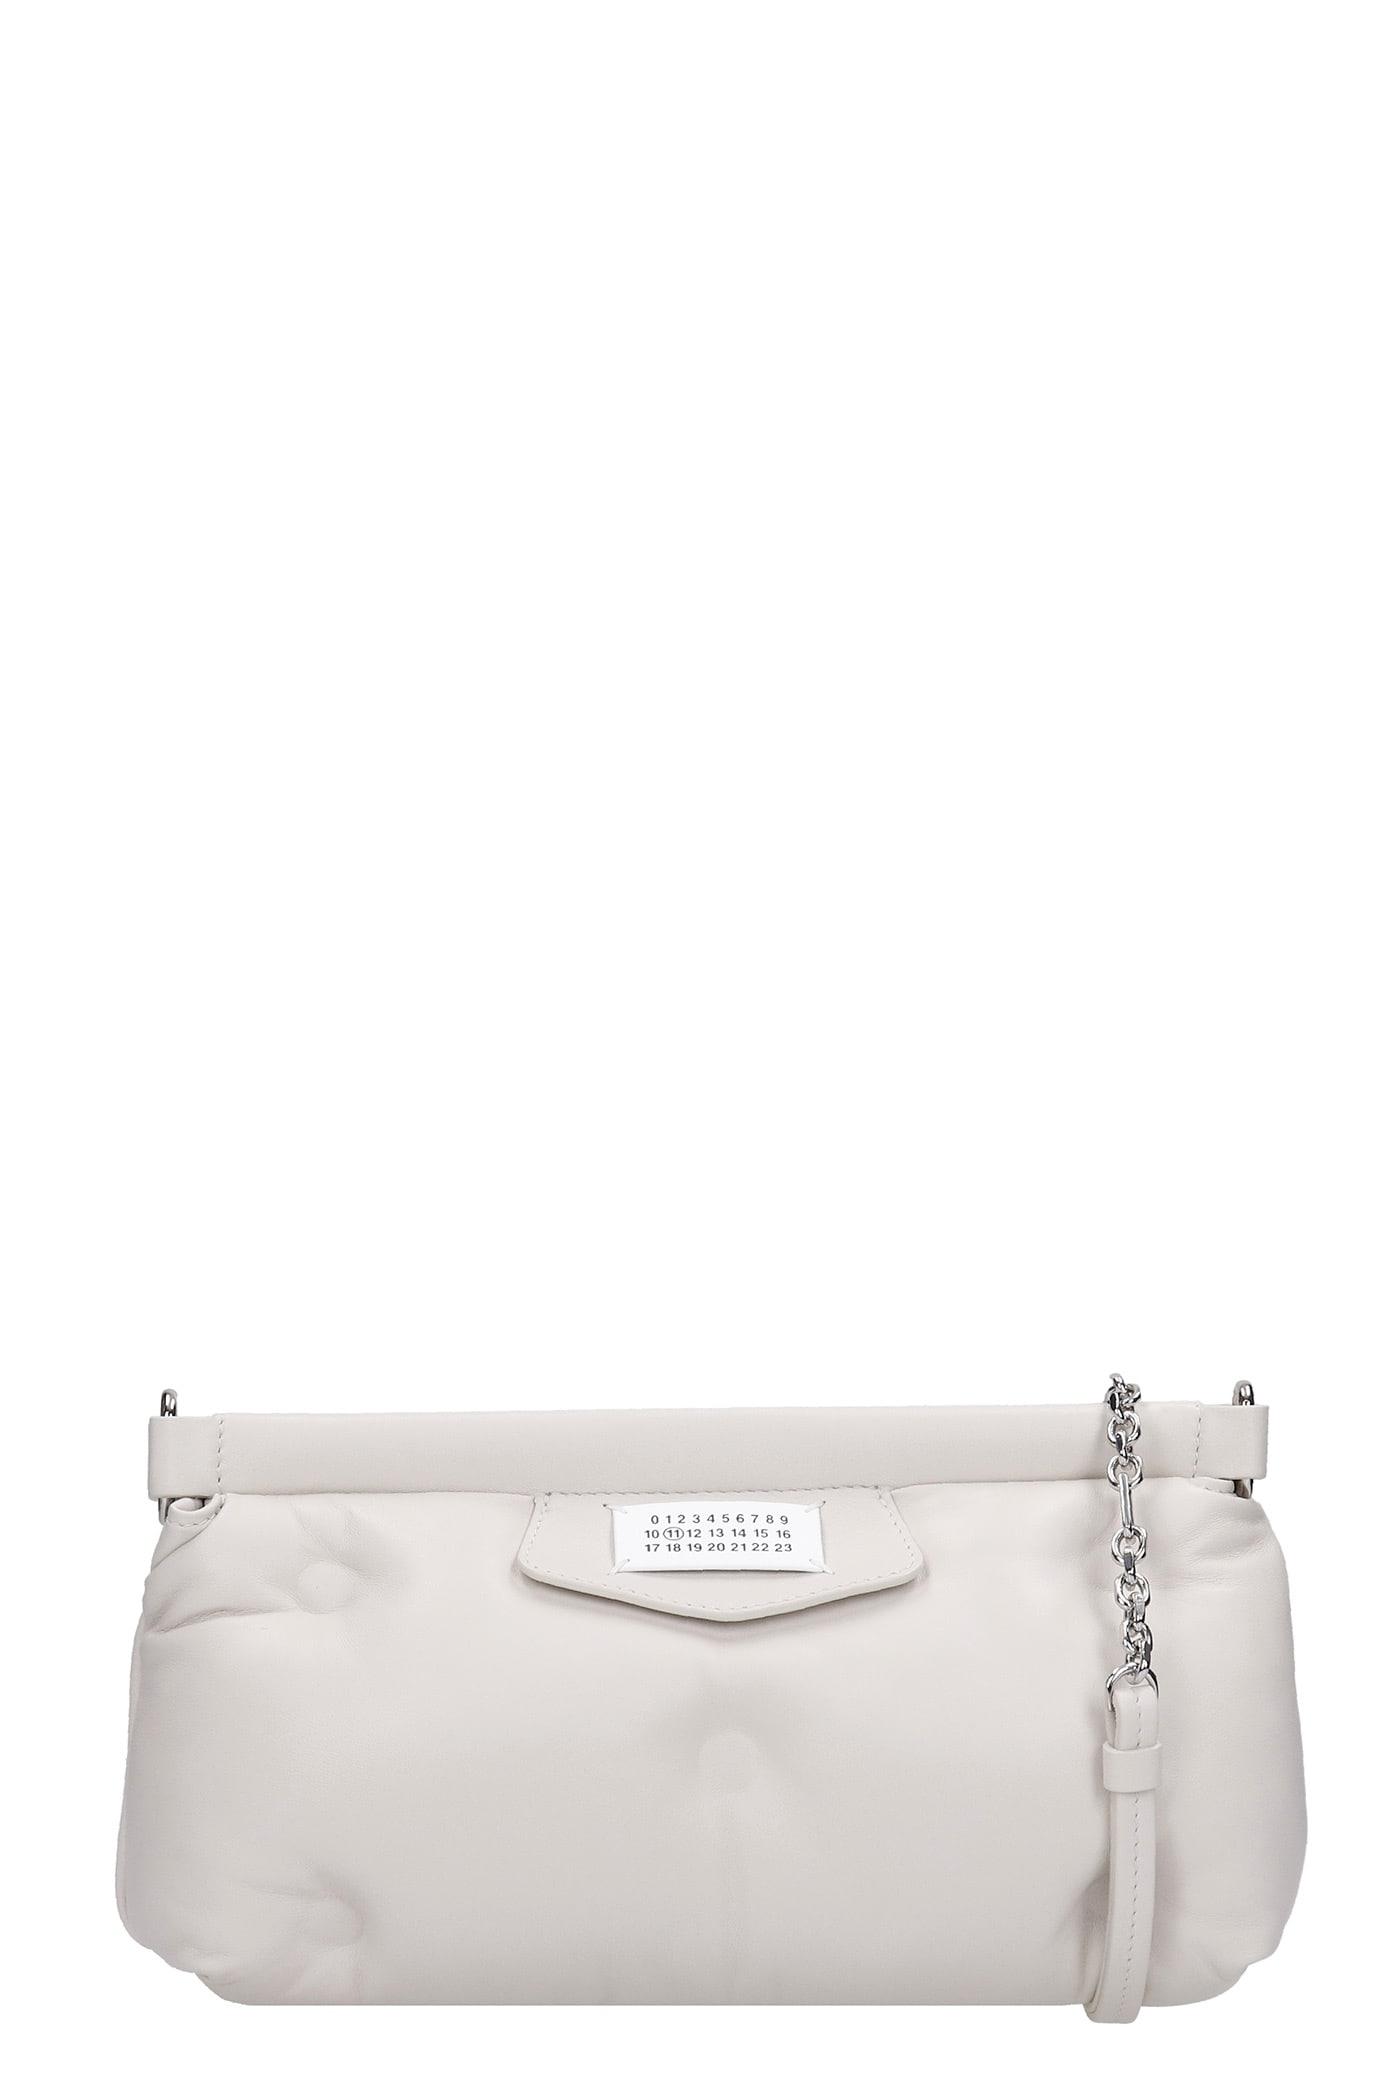 Maison Margiela Clutch In White Leather